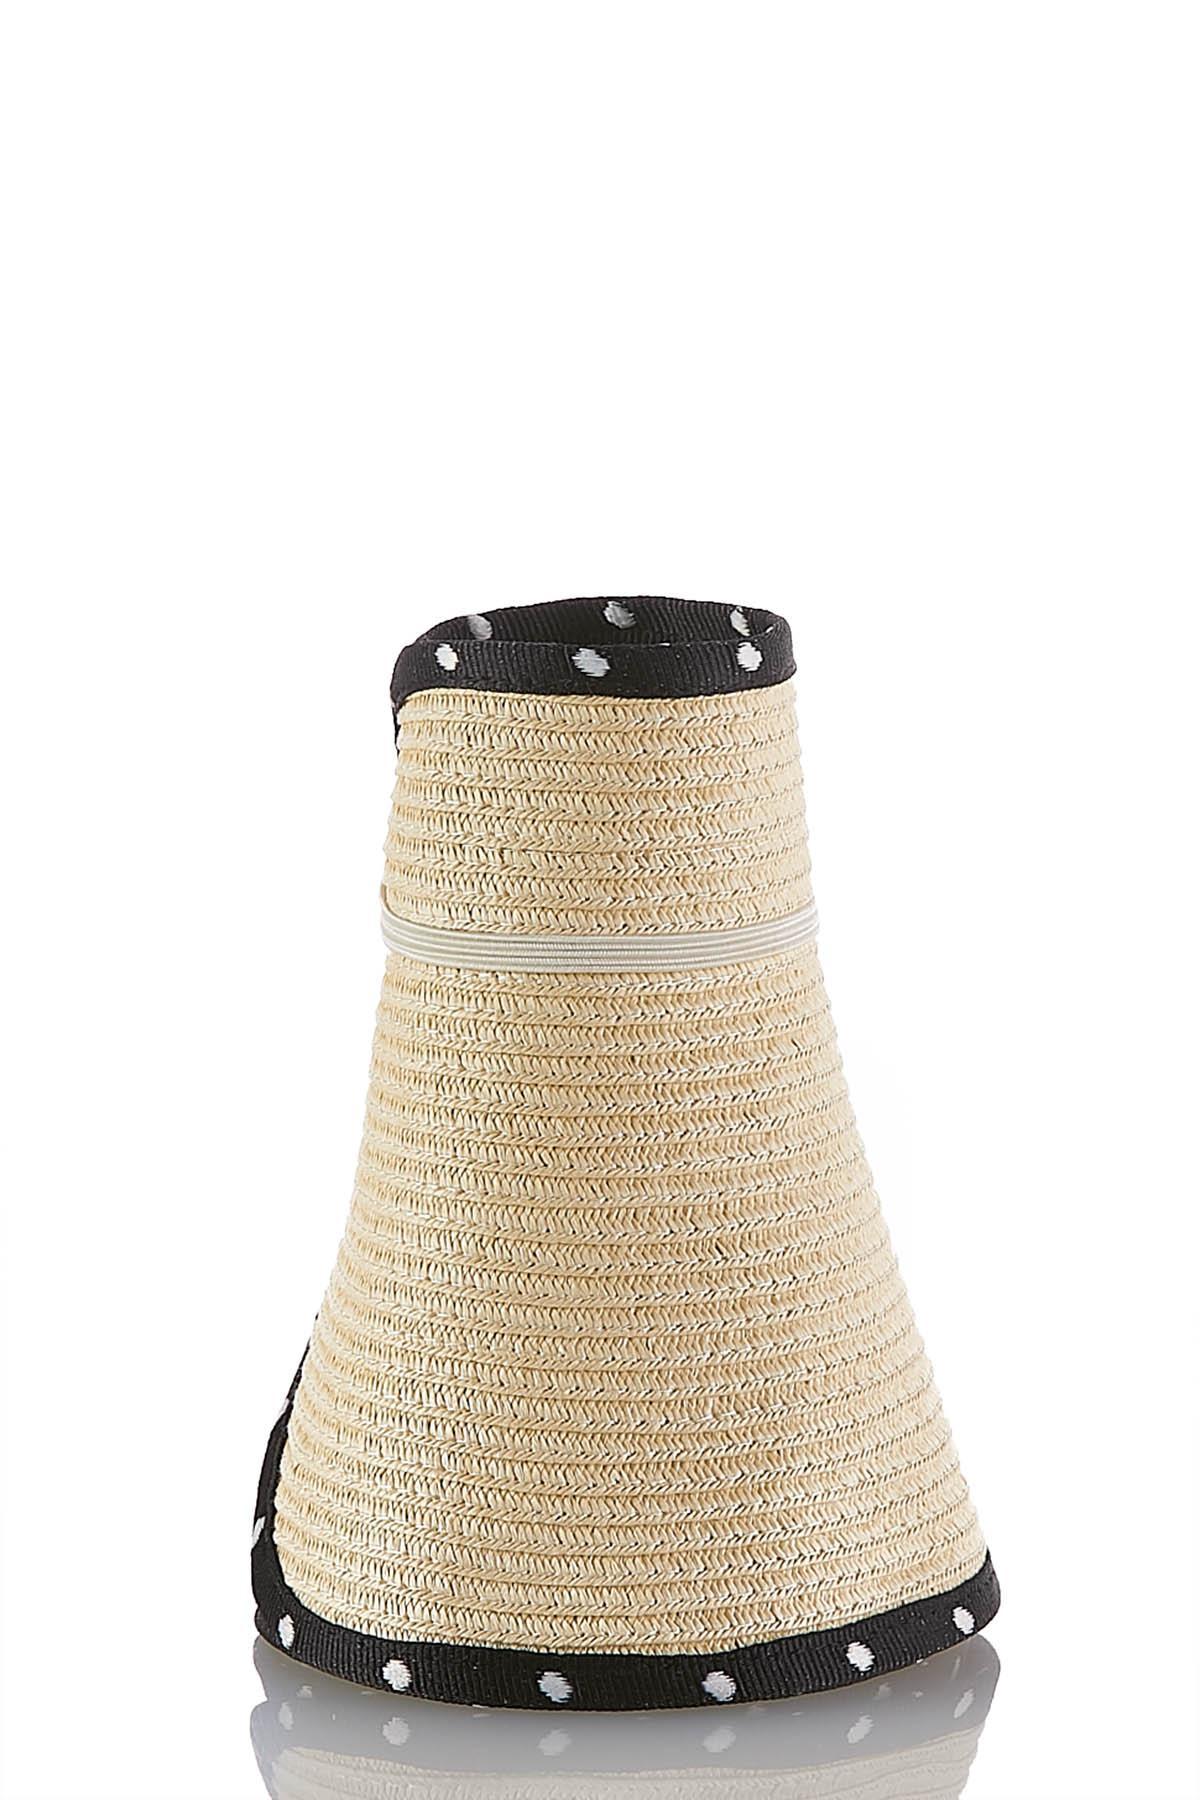 Polka Dot Visor Floppy Hat (Item #43846174)